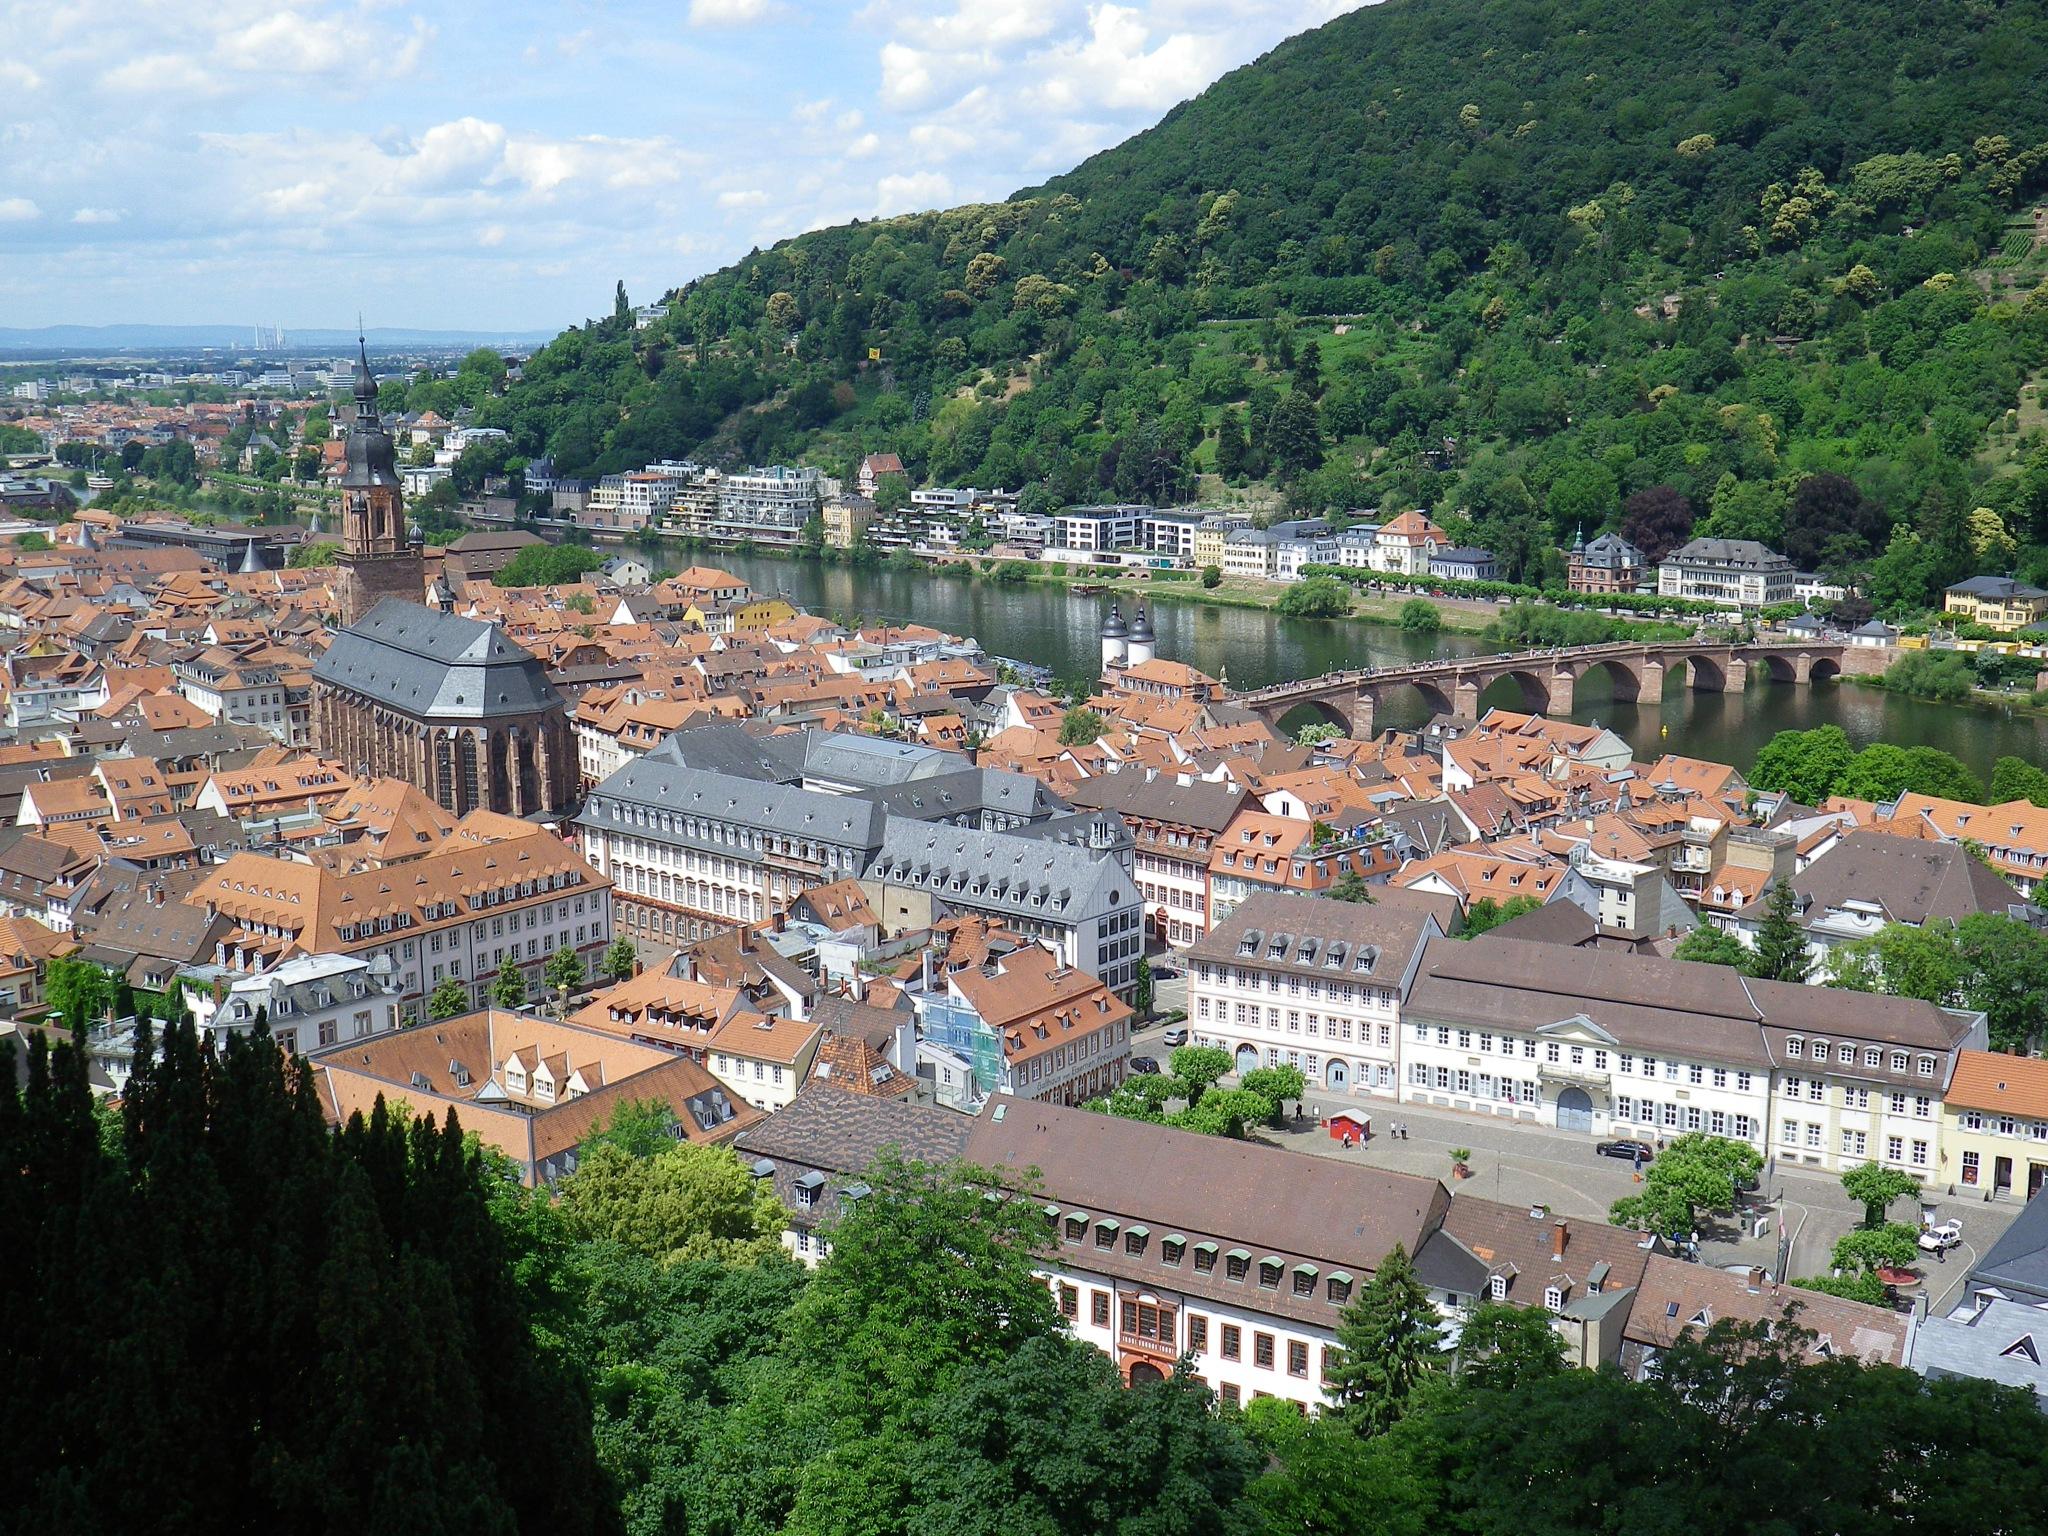 Heidelberg 2011 by Vero_Pics